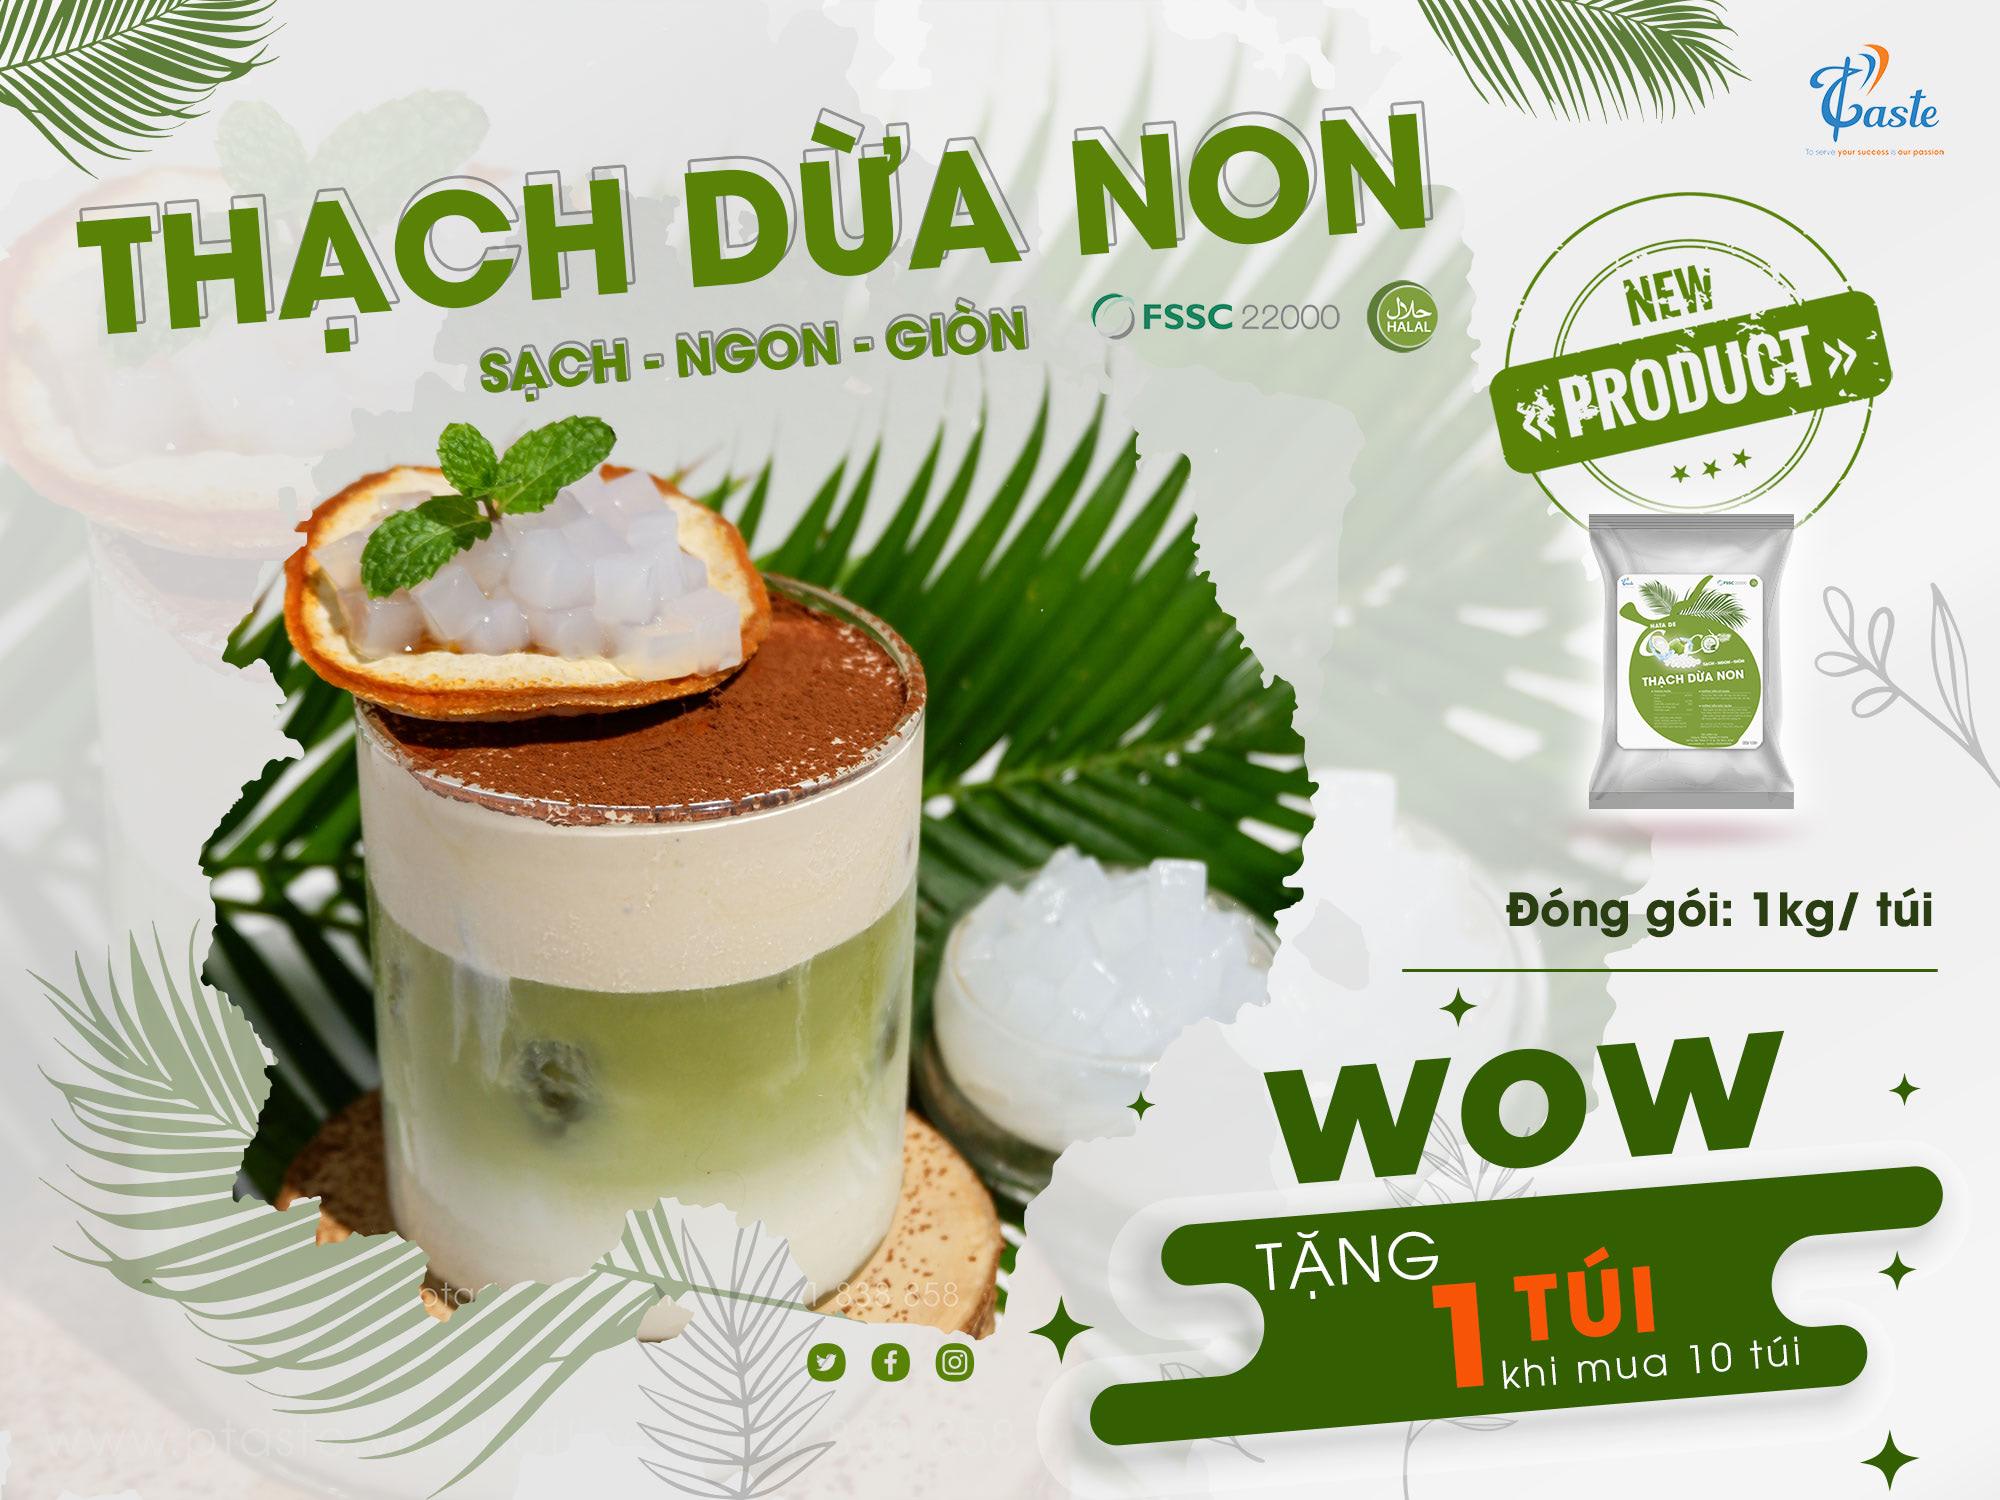 thạch dừa non P-taste